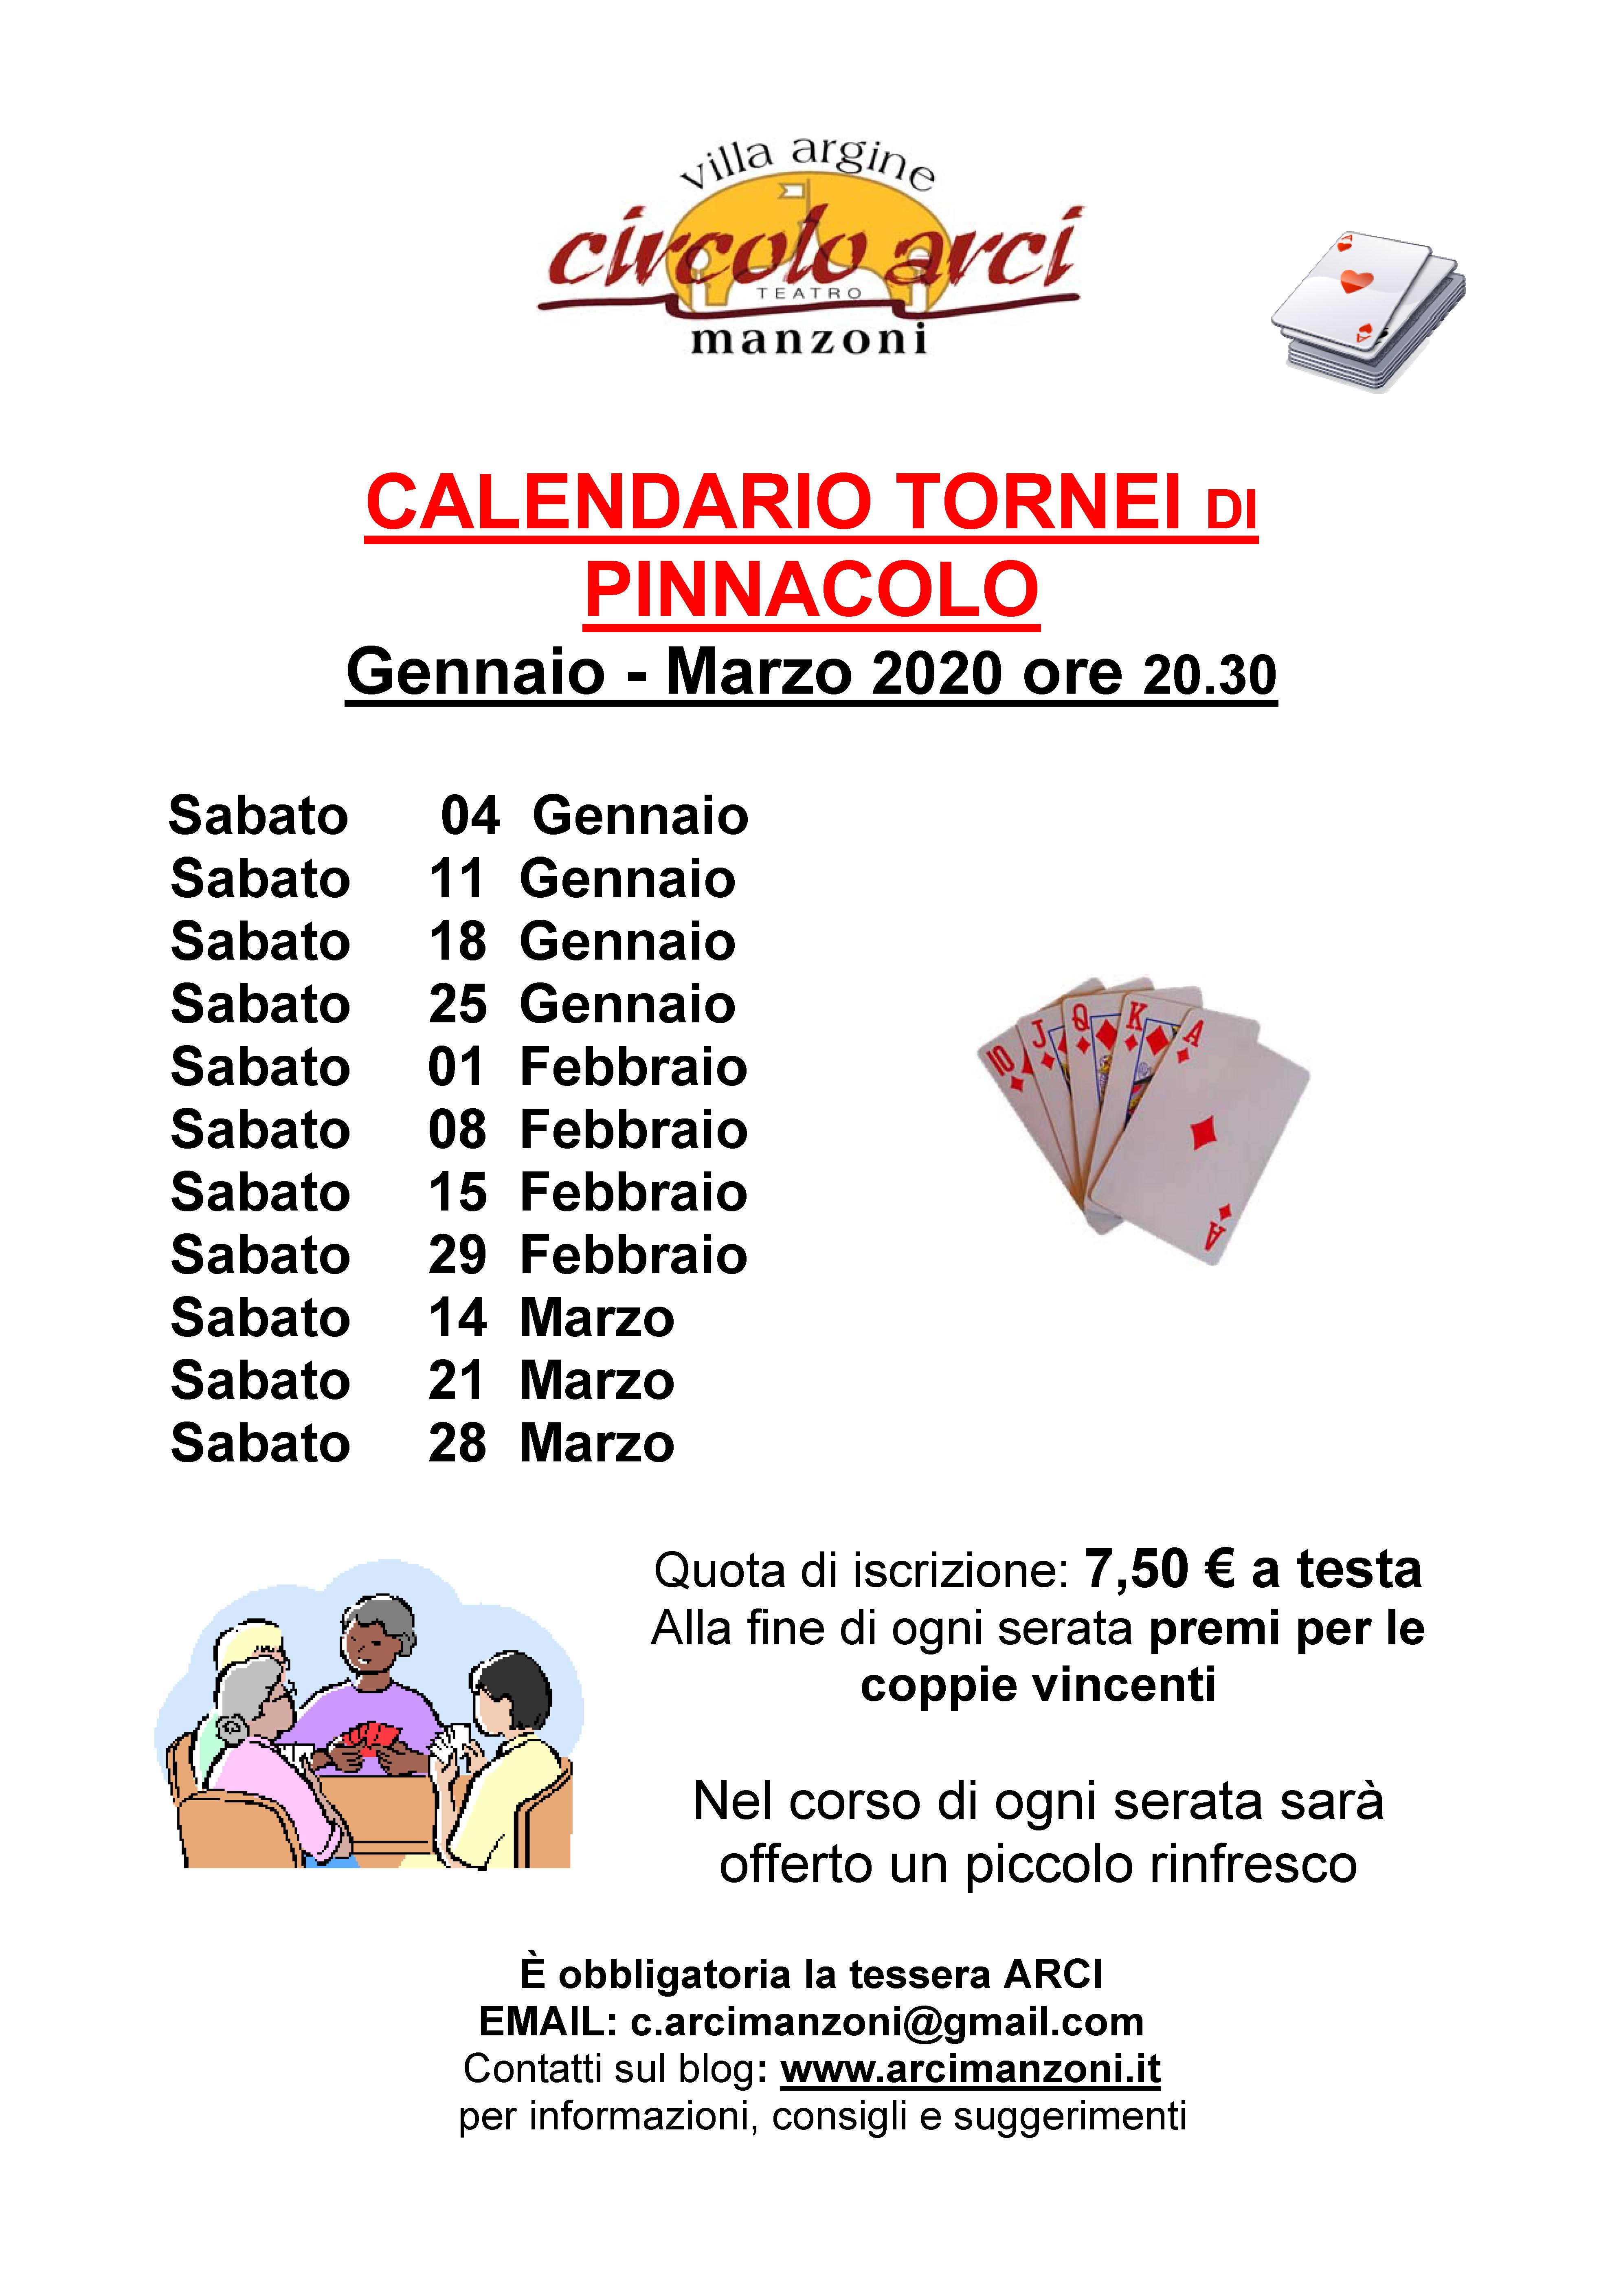 Pinnacolo Gennaio-Marzo 2020